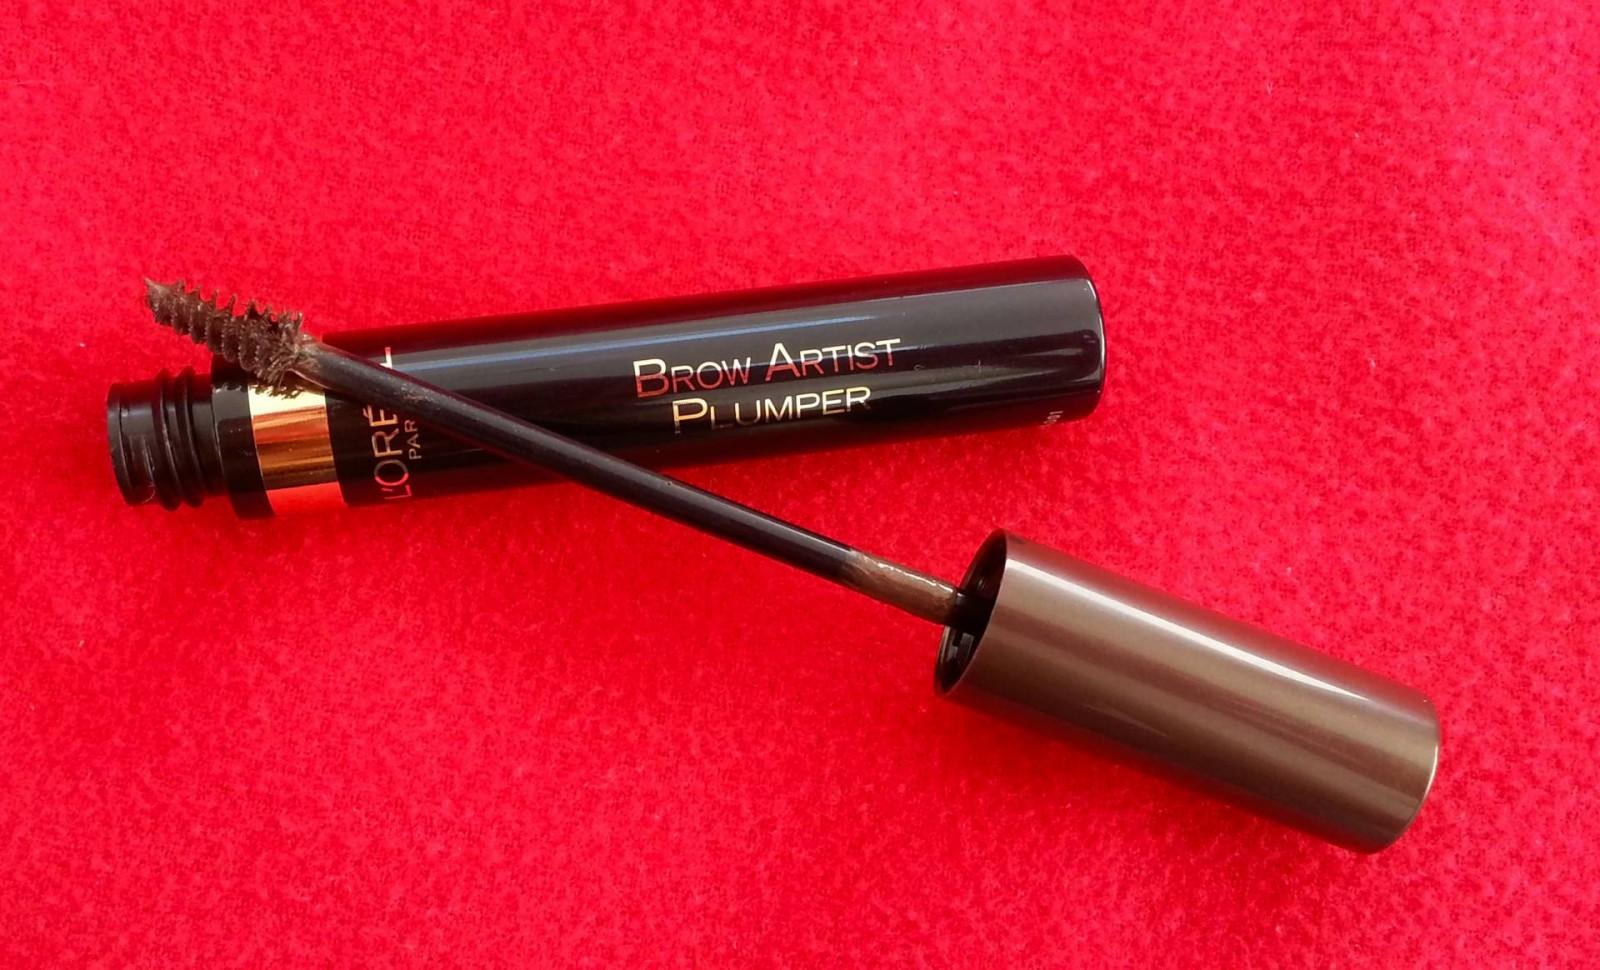 Eyebrow Gels: Splurge v Save, L'oreal brow artist plumper